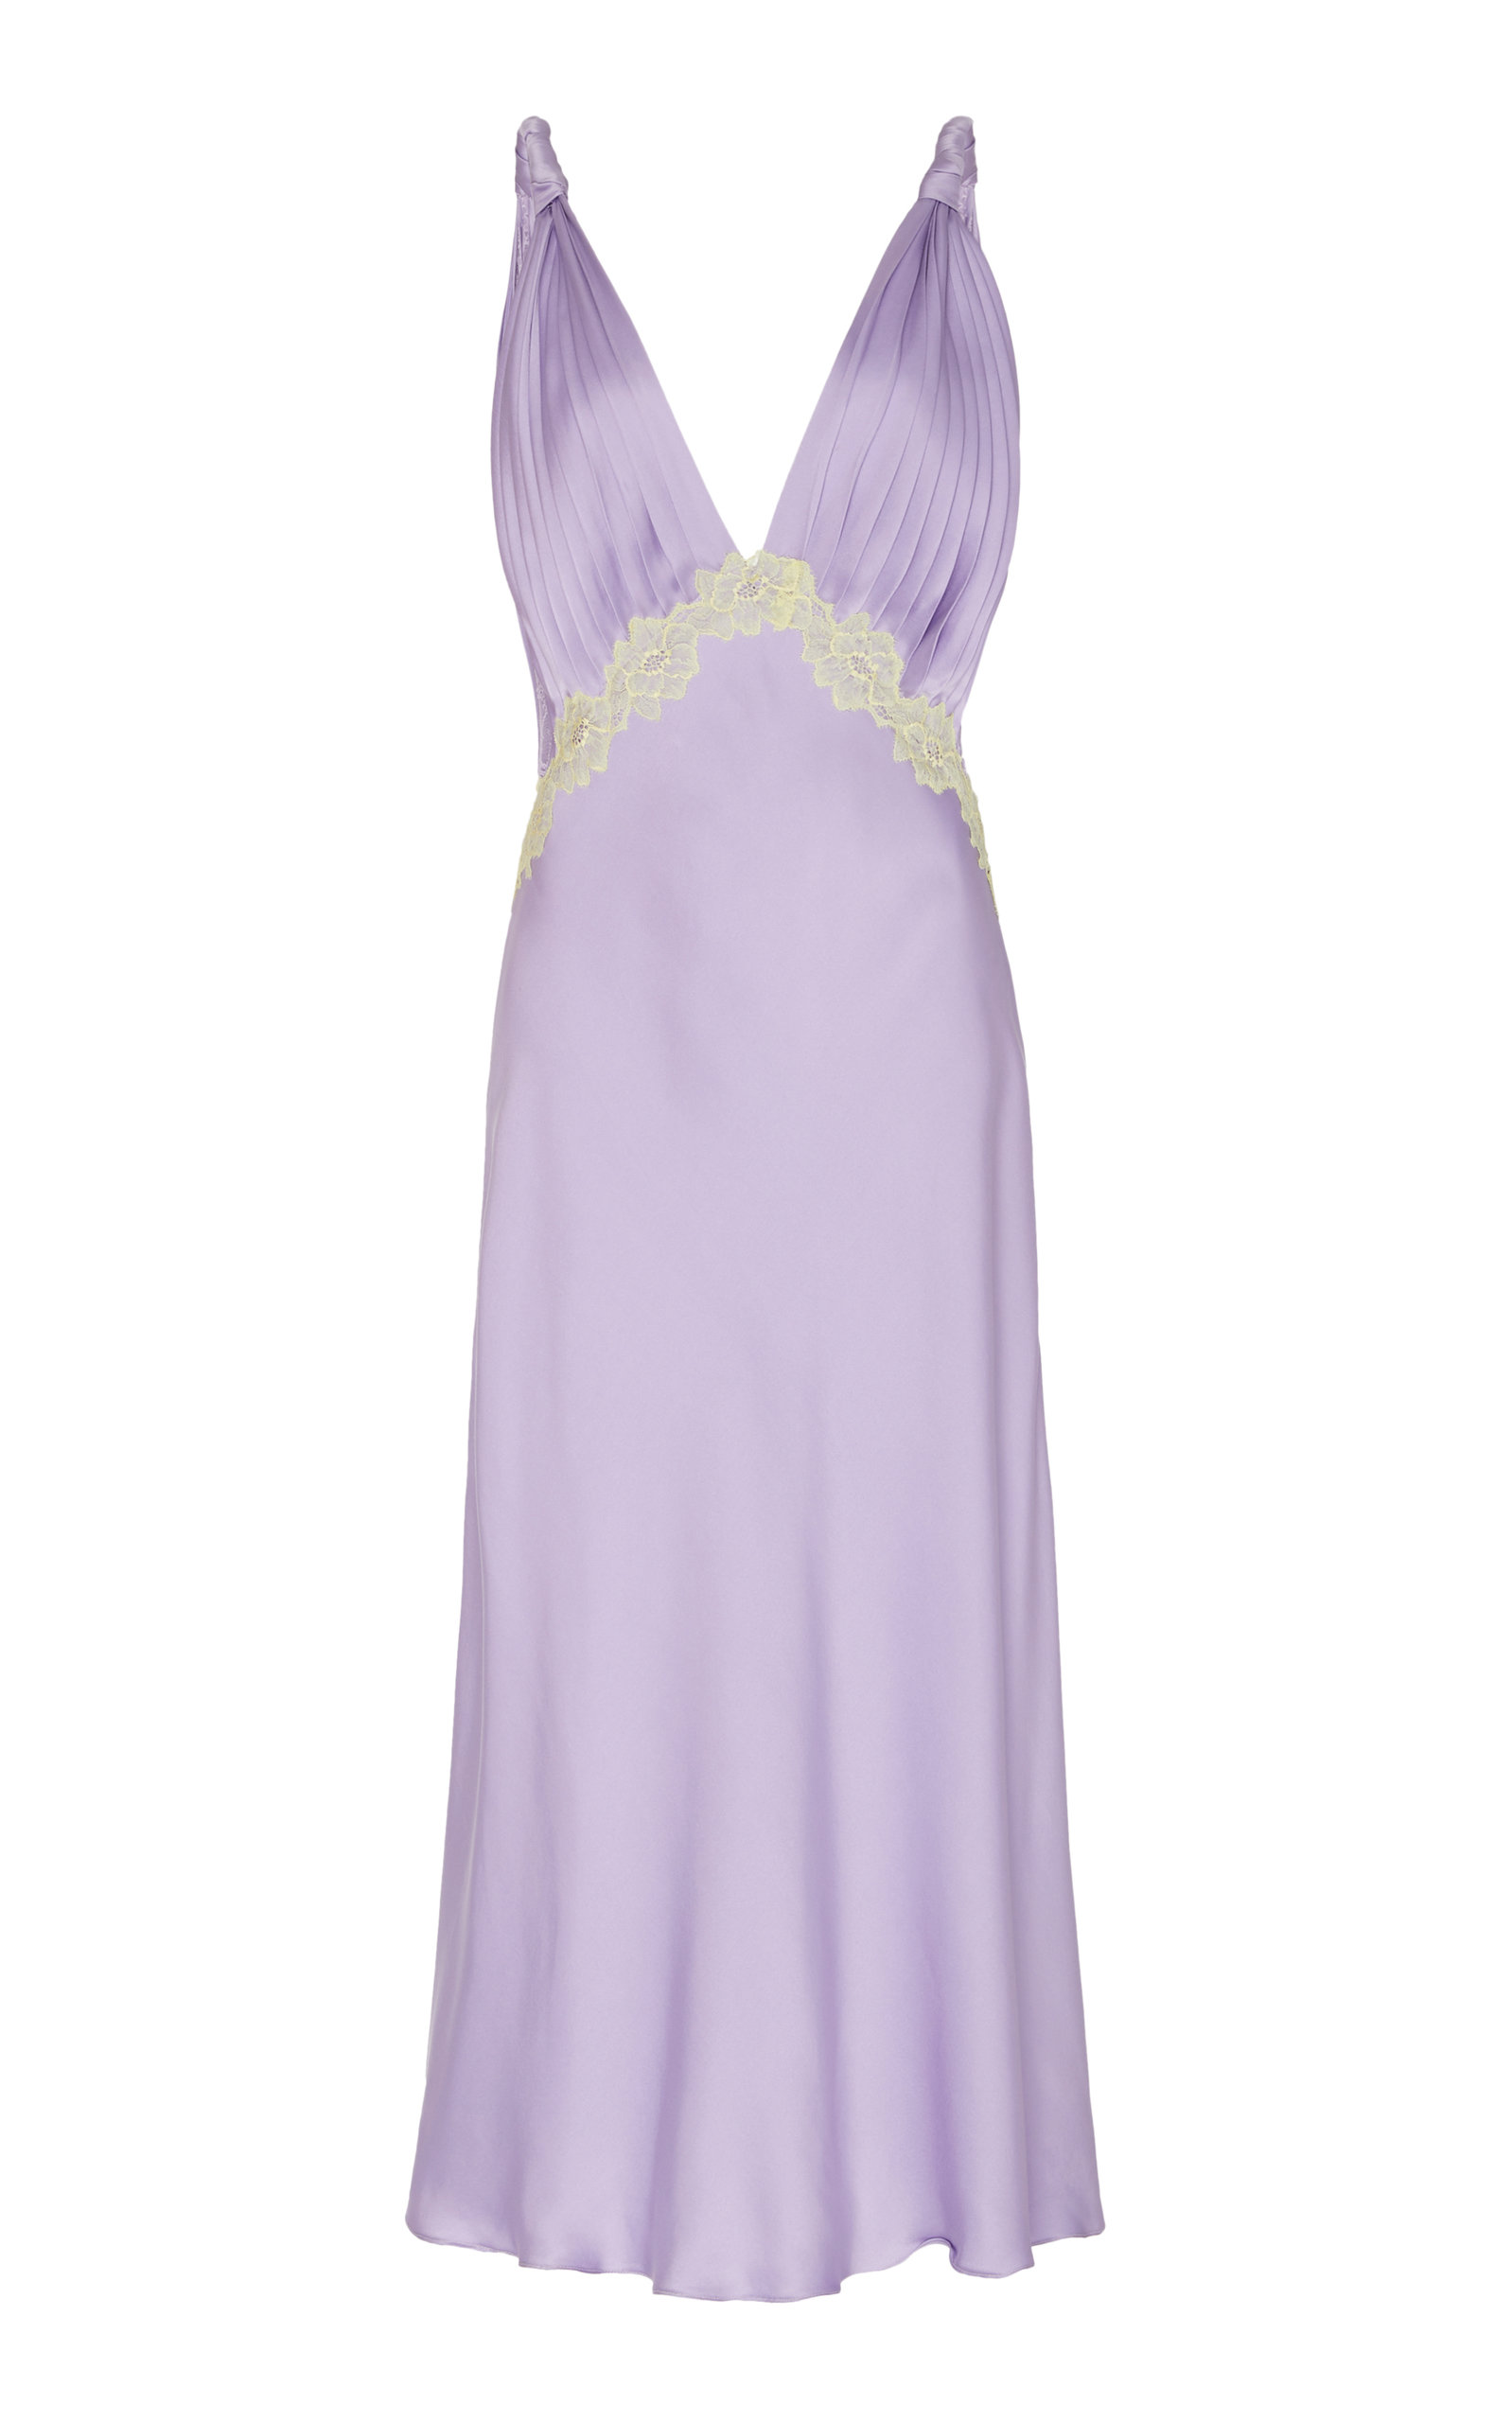 Buy Jonathan Simkhai Kiara Lace-Detailed Satin Dress online, shop Jonathan Simkhai at the best price